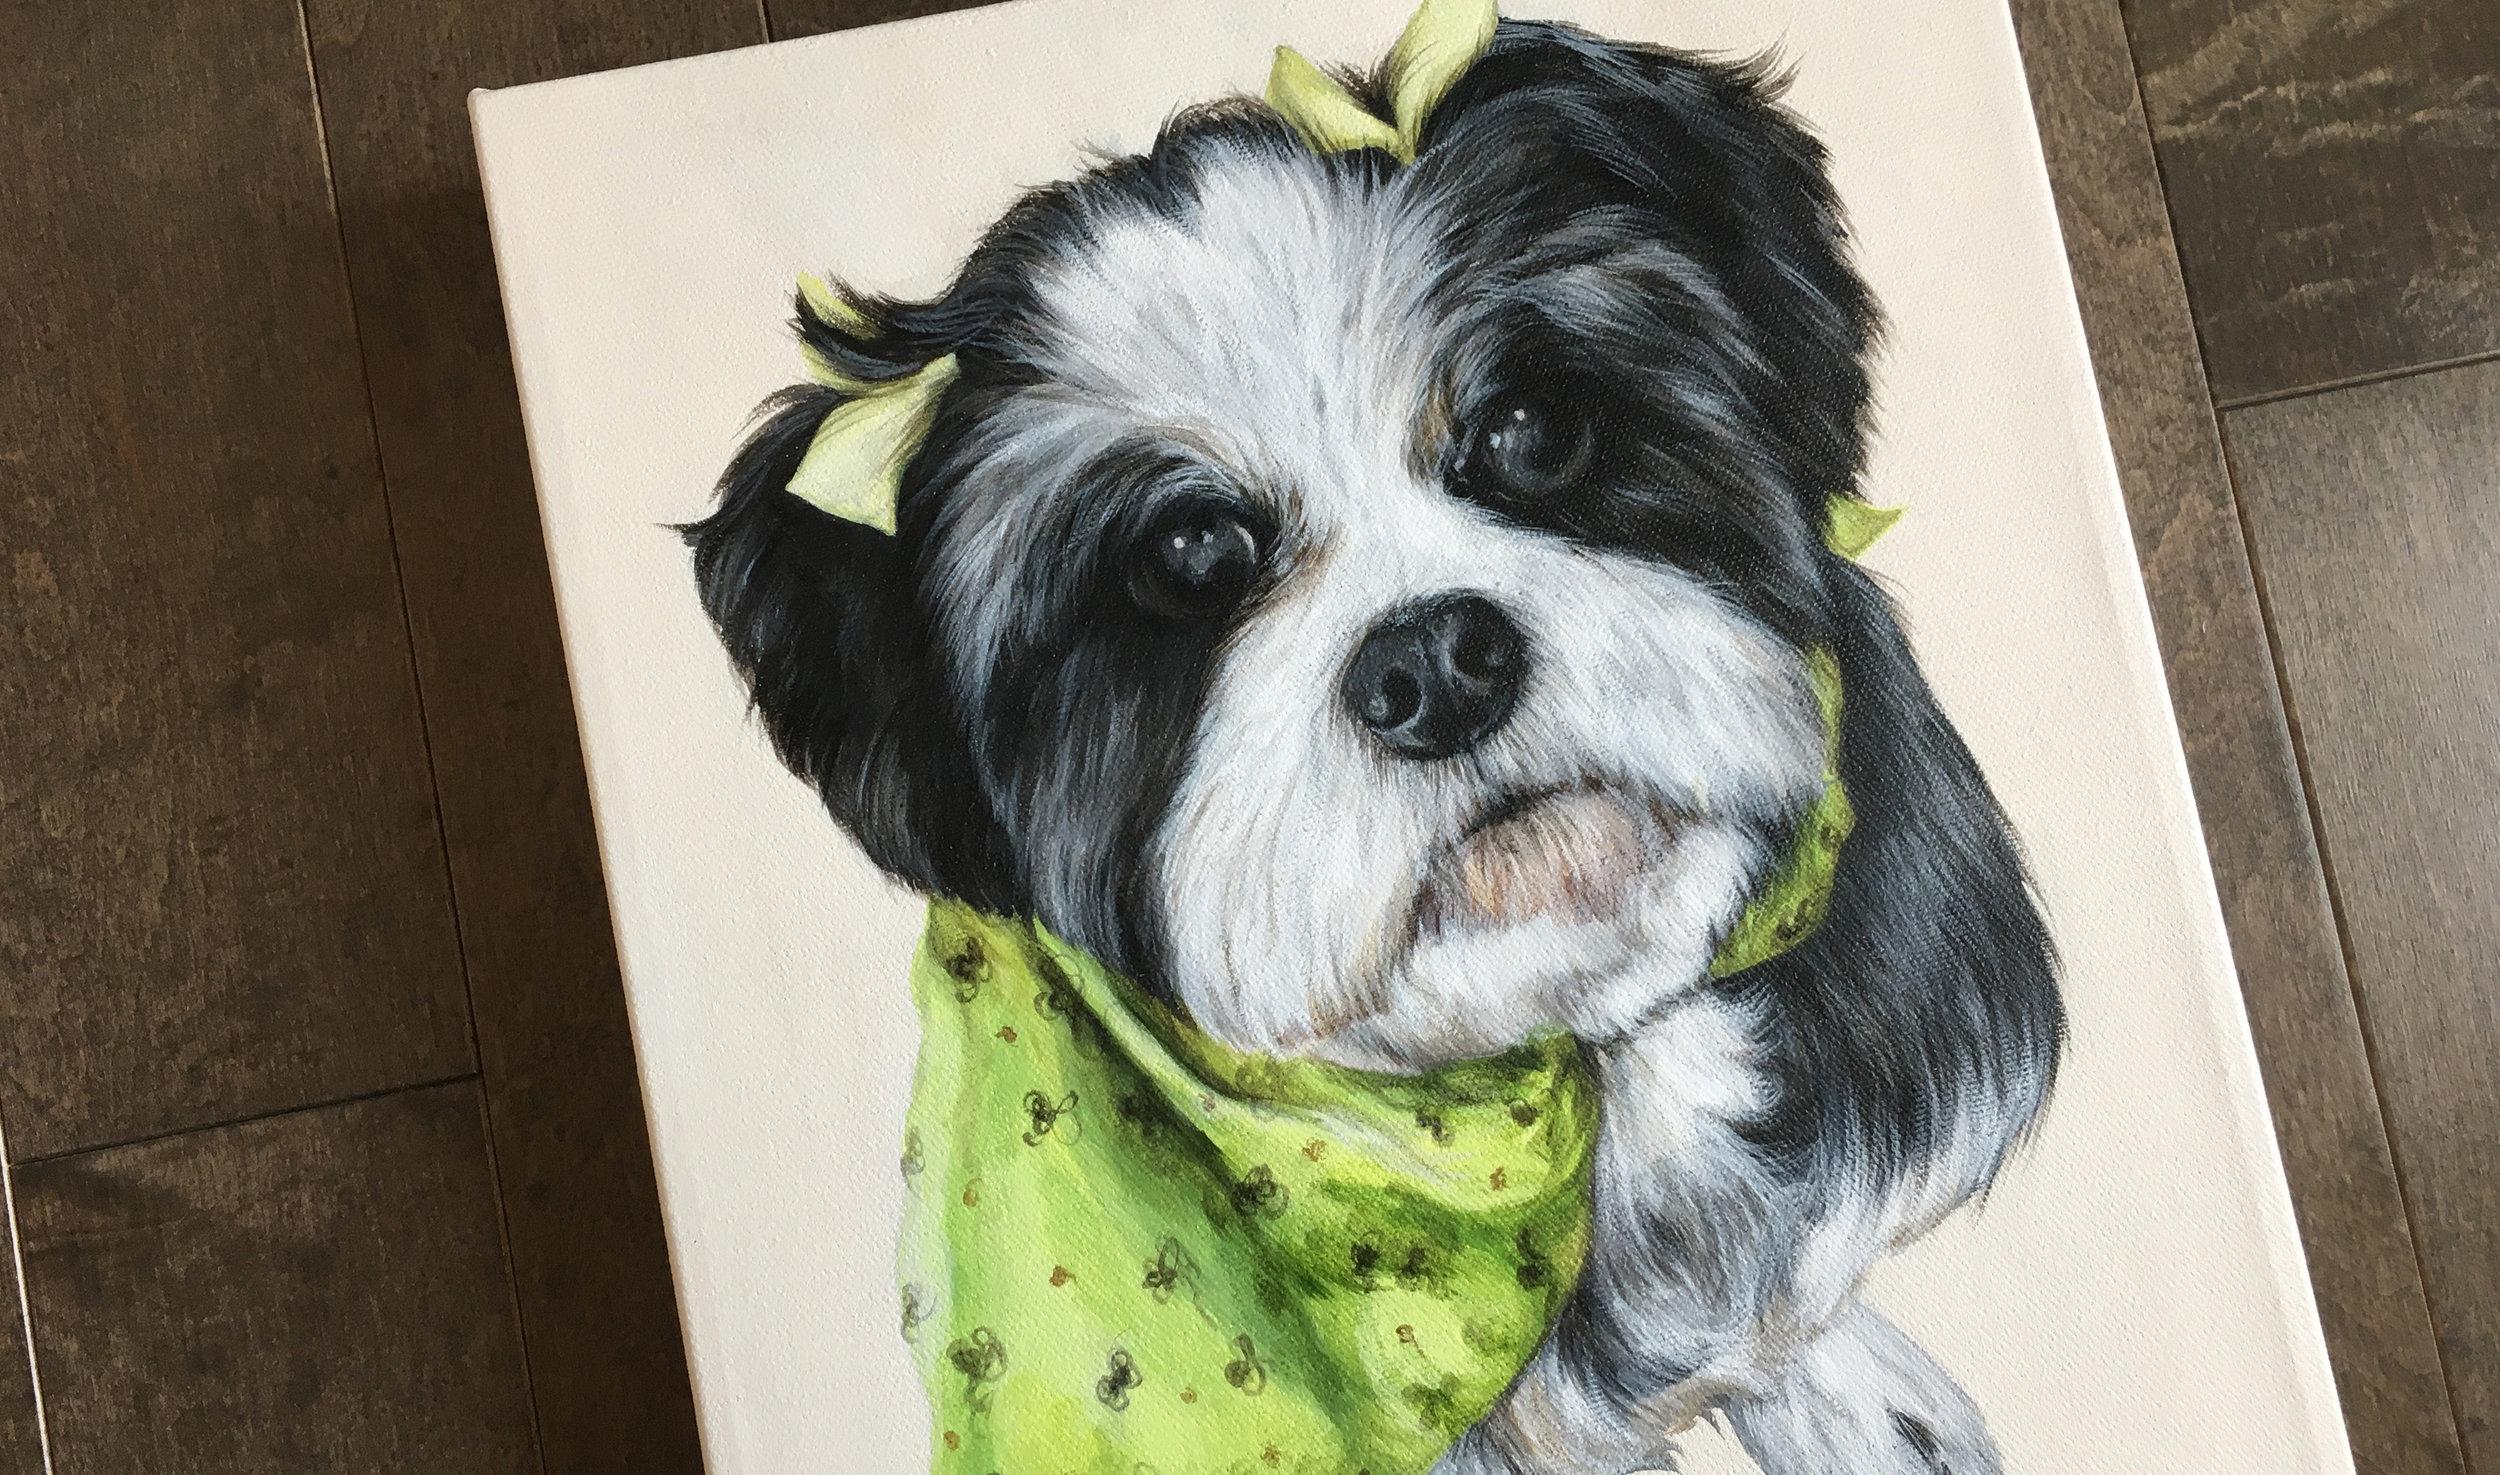 Daisy (Shih Tzu) painting